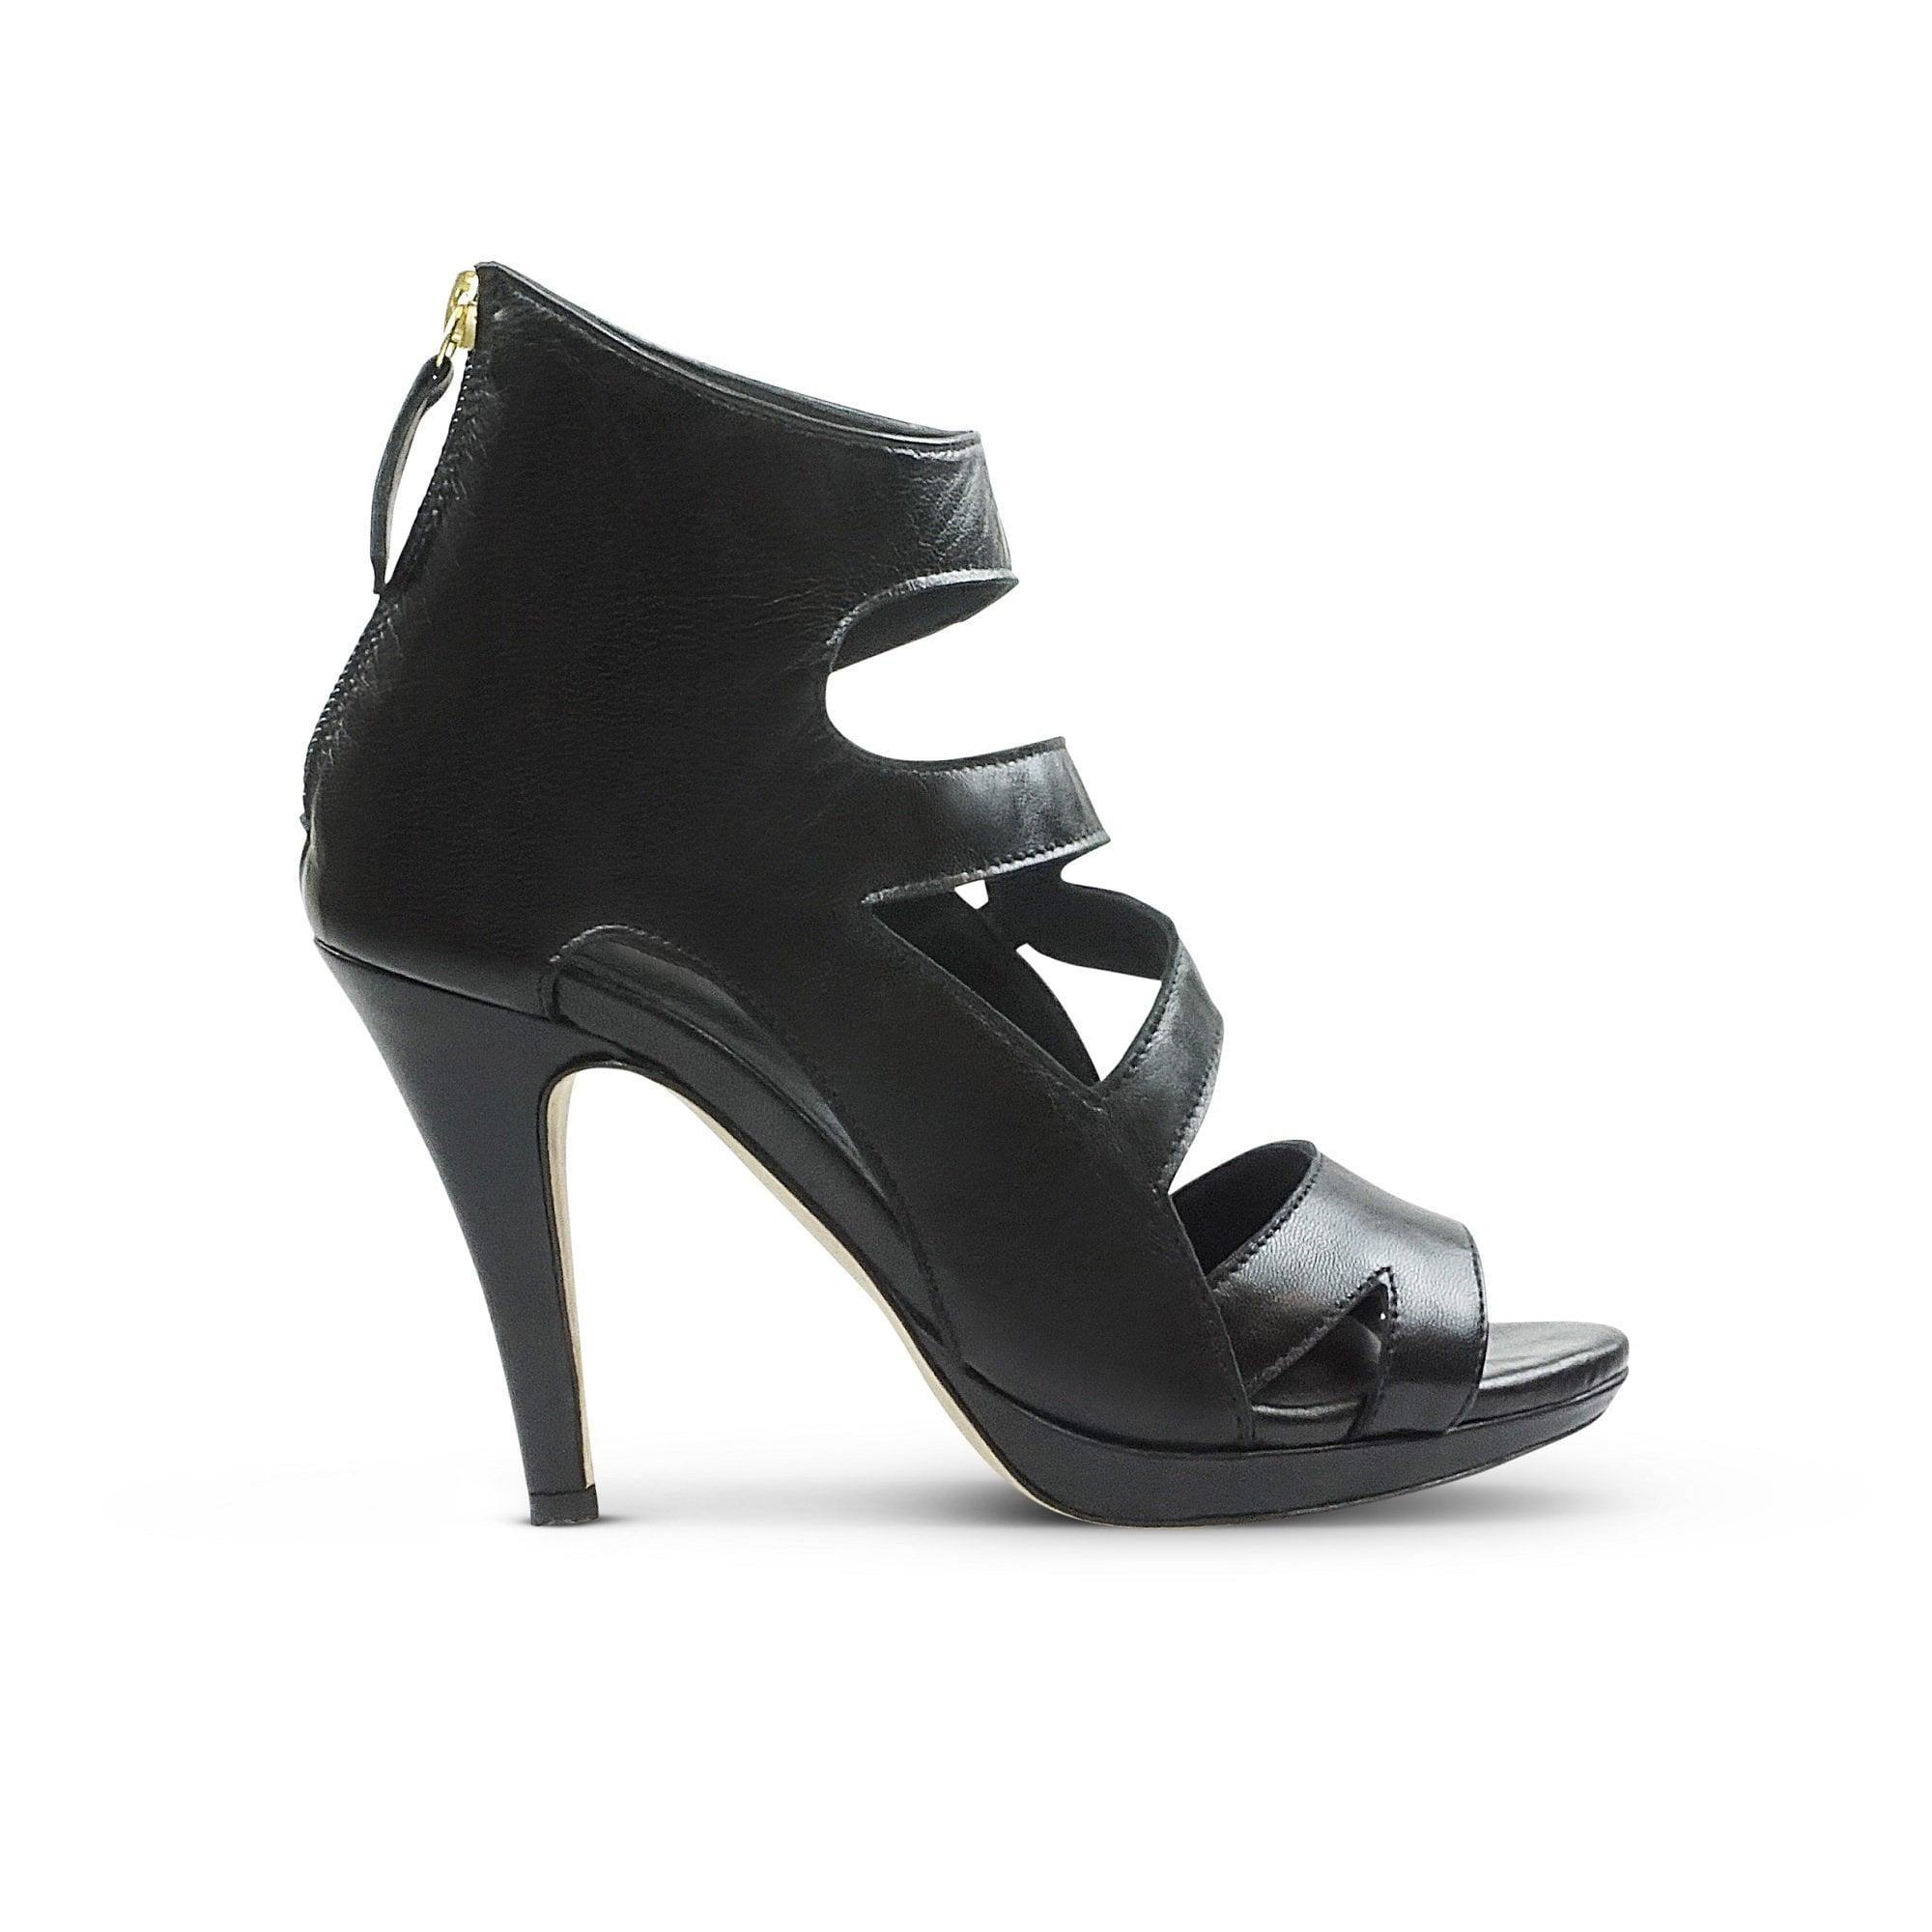 3bb4d4ee06d5 SARGOSSA Dare Nappa Leather Strappy Heel in Black